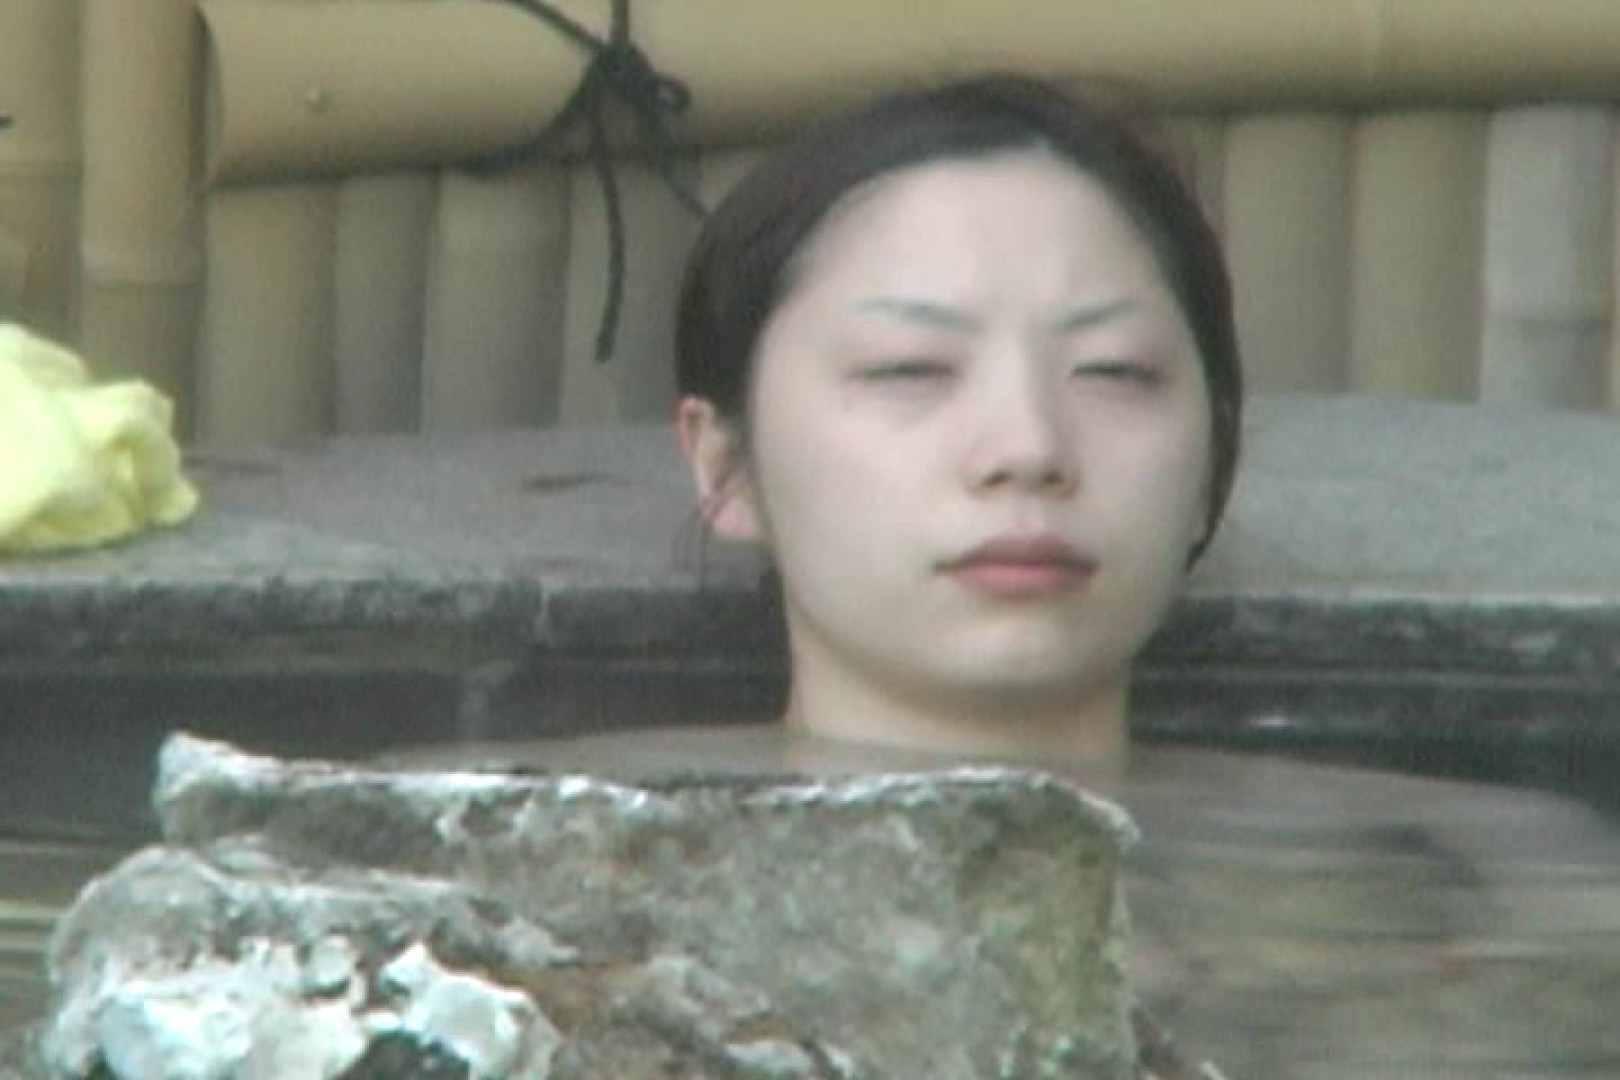 Aquaな露天風呂Vol.596 OLセックス  77画像 39